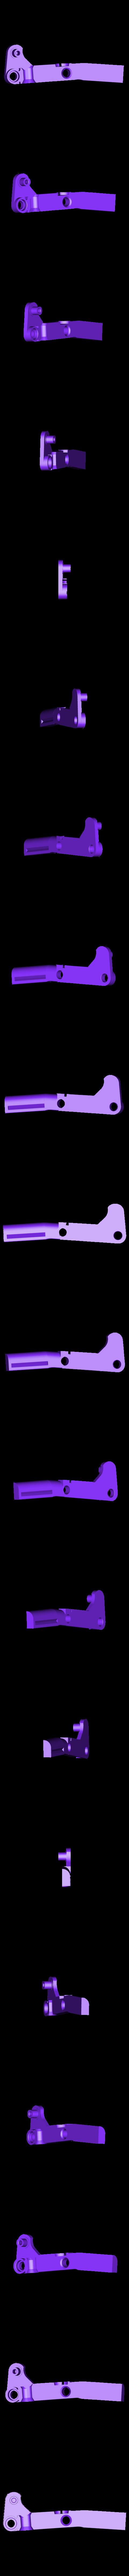 lever_part_b.STL Download free STL file UM2+ Lazy Lever • 3D print design, Raeunn3D